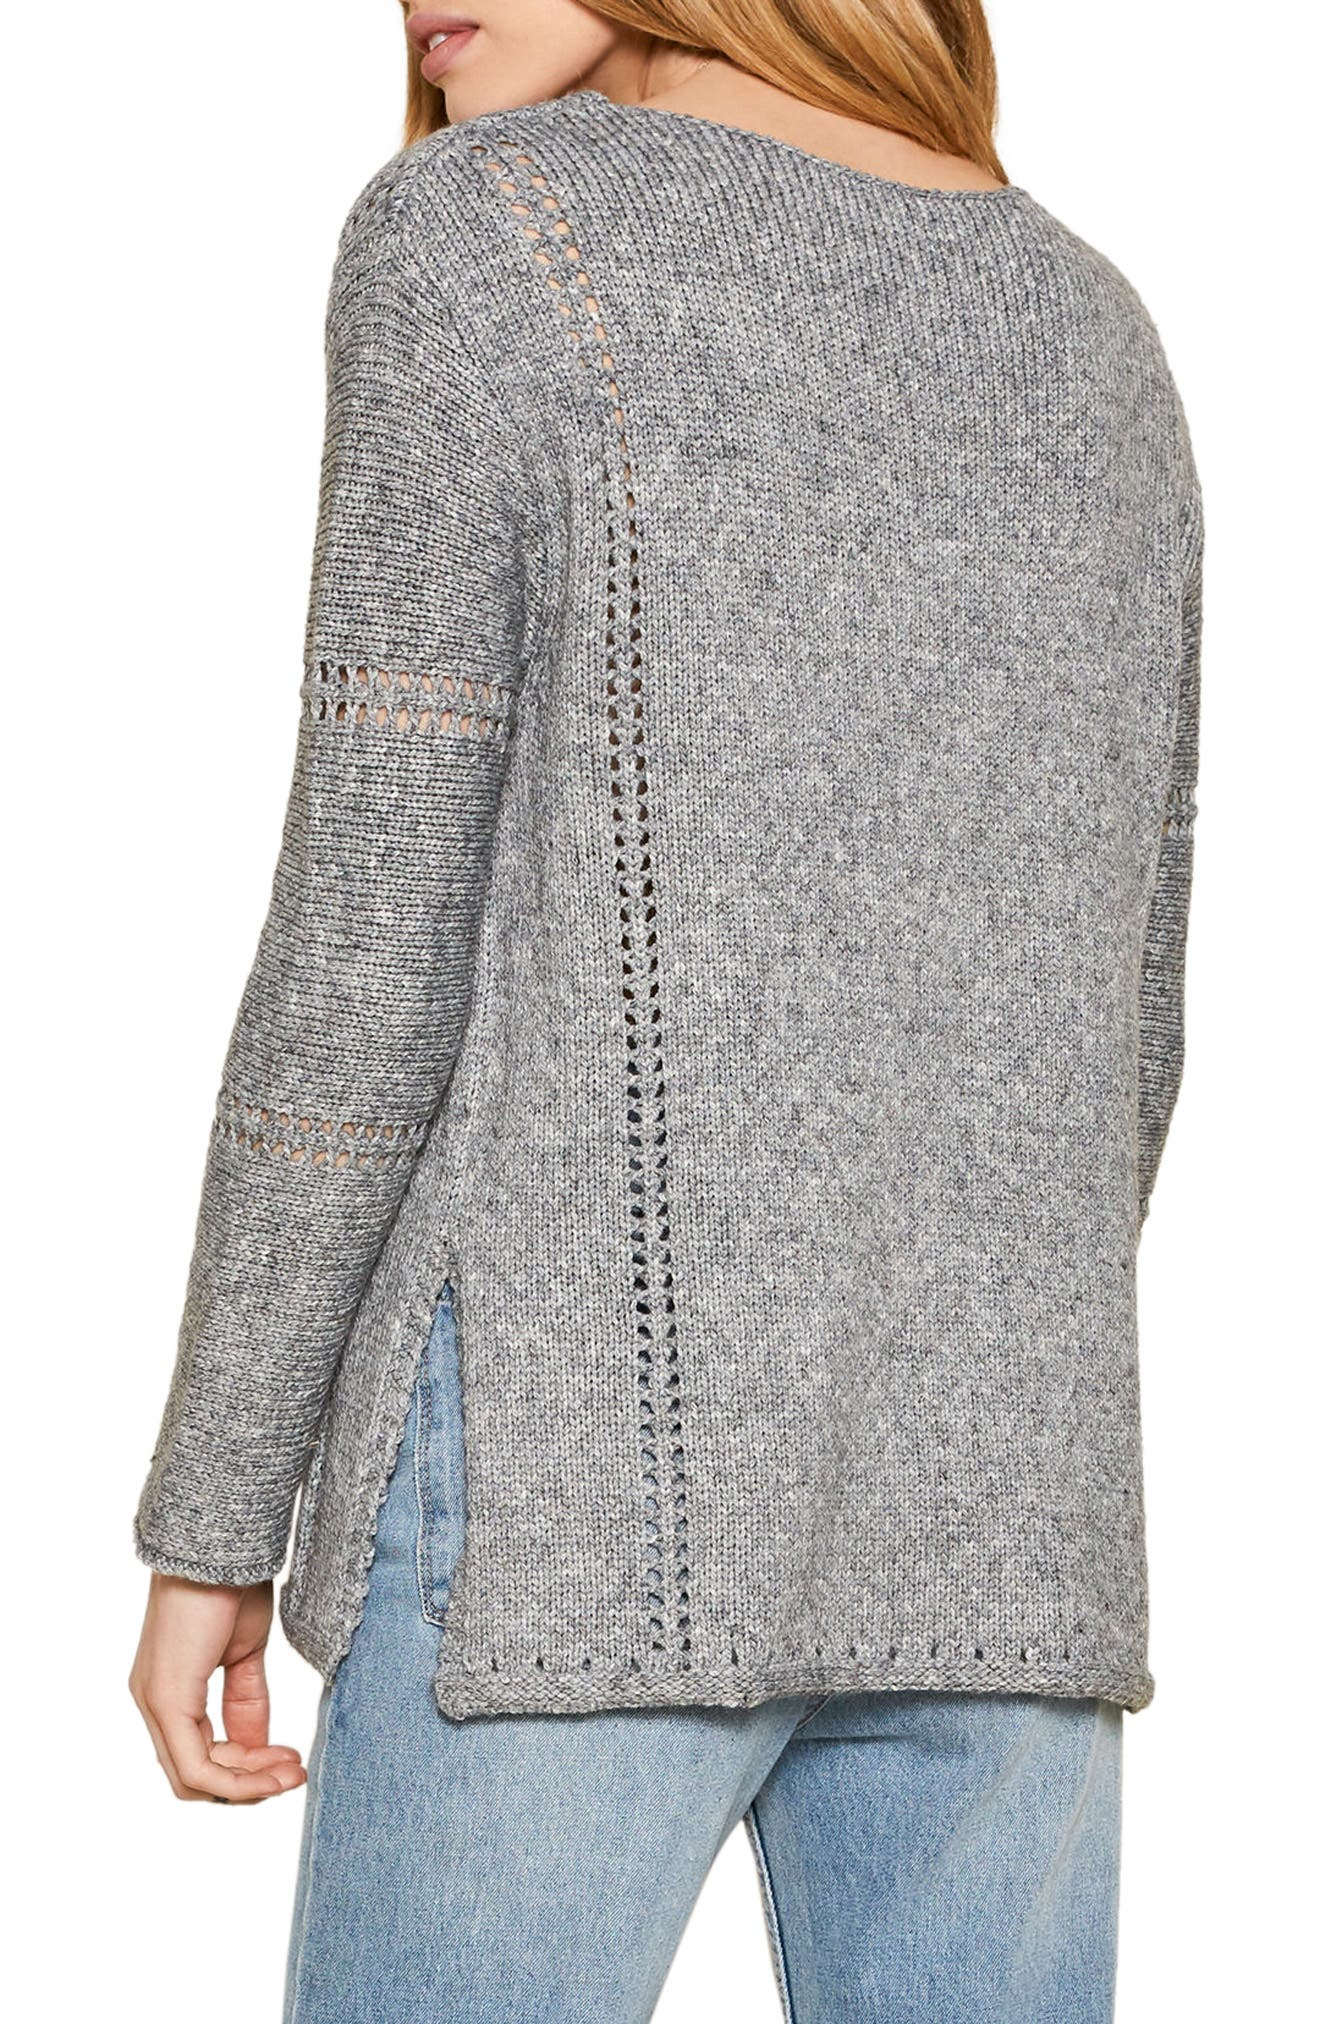 Rickerson Sweater,                             Alternate thumbnail 2, color,                             025